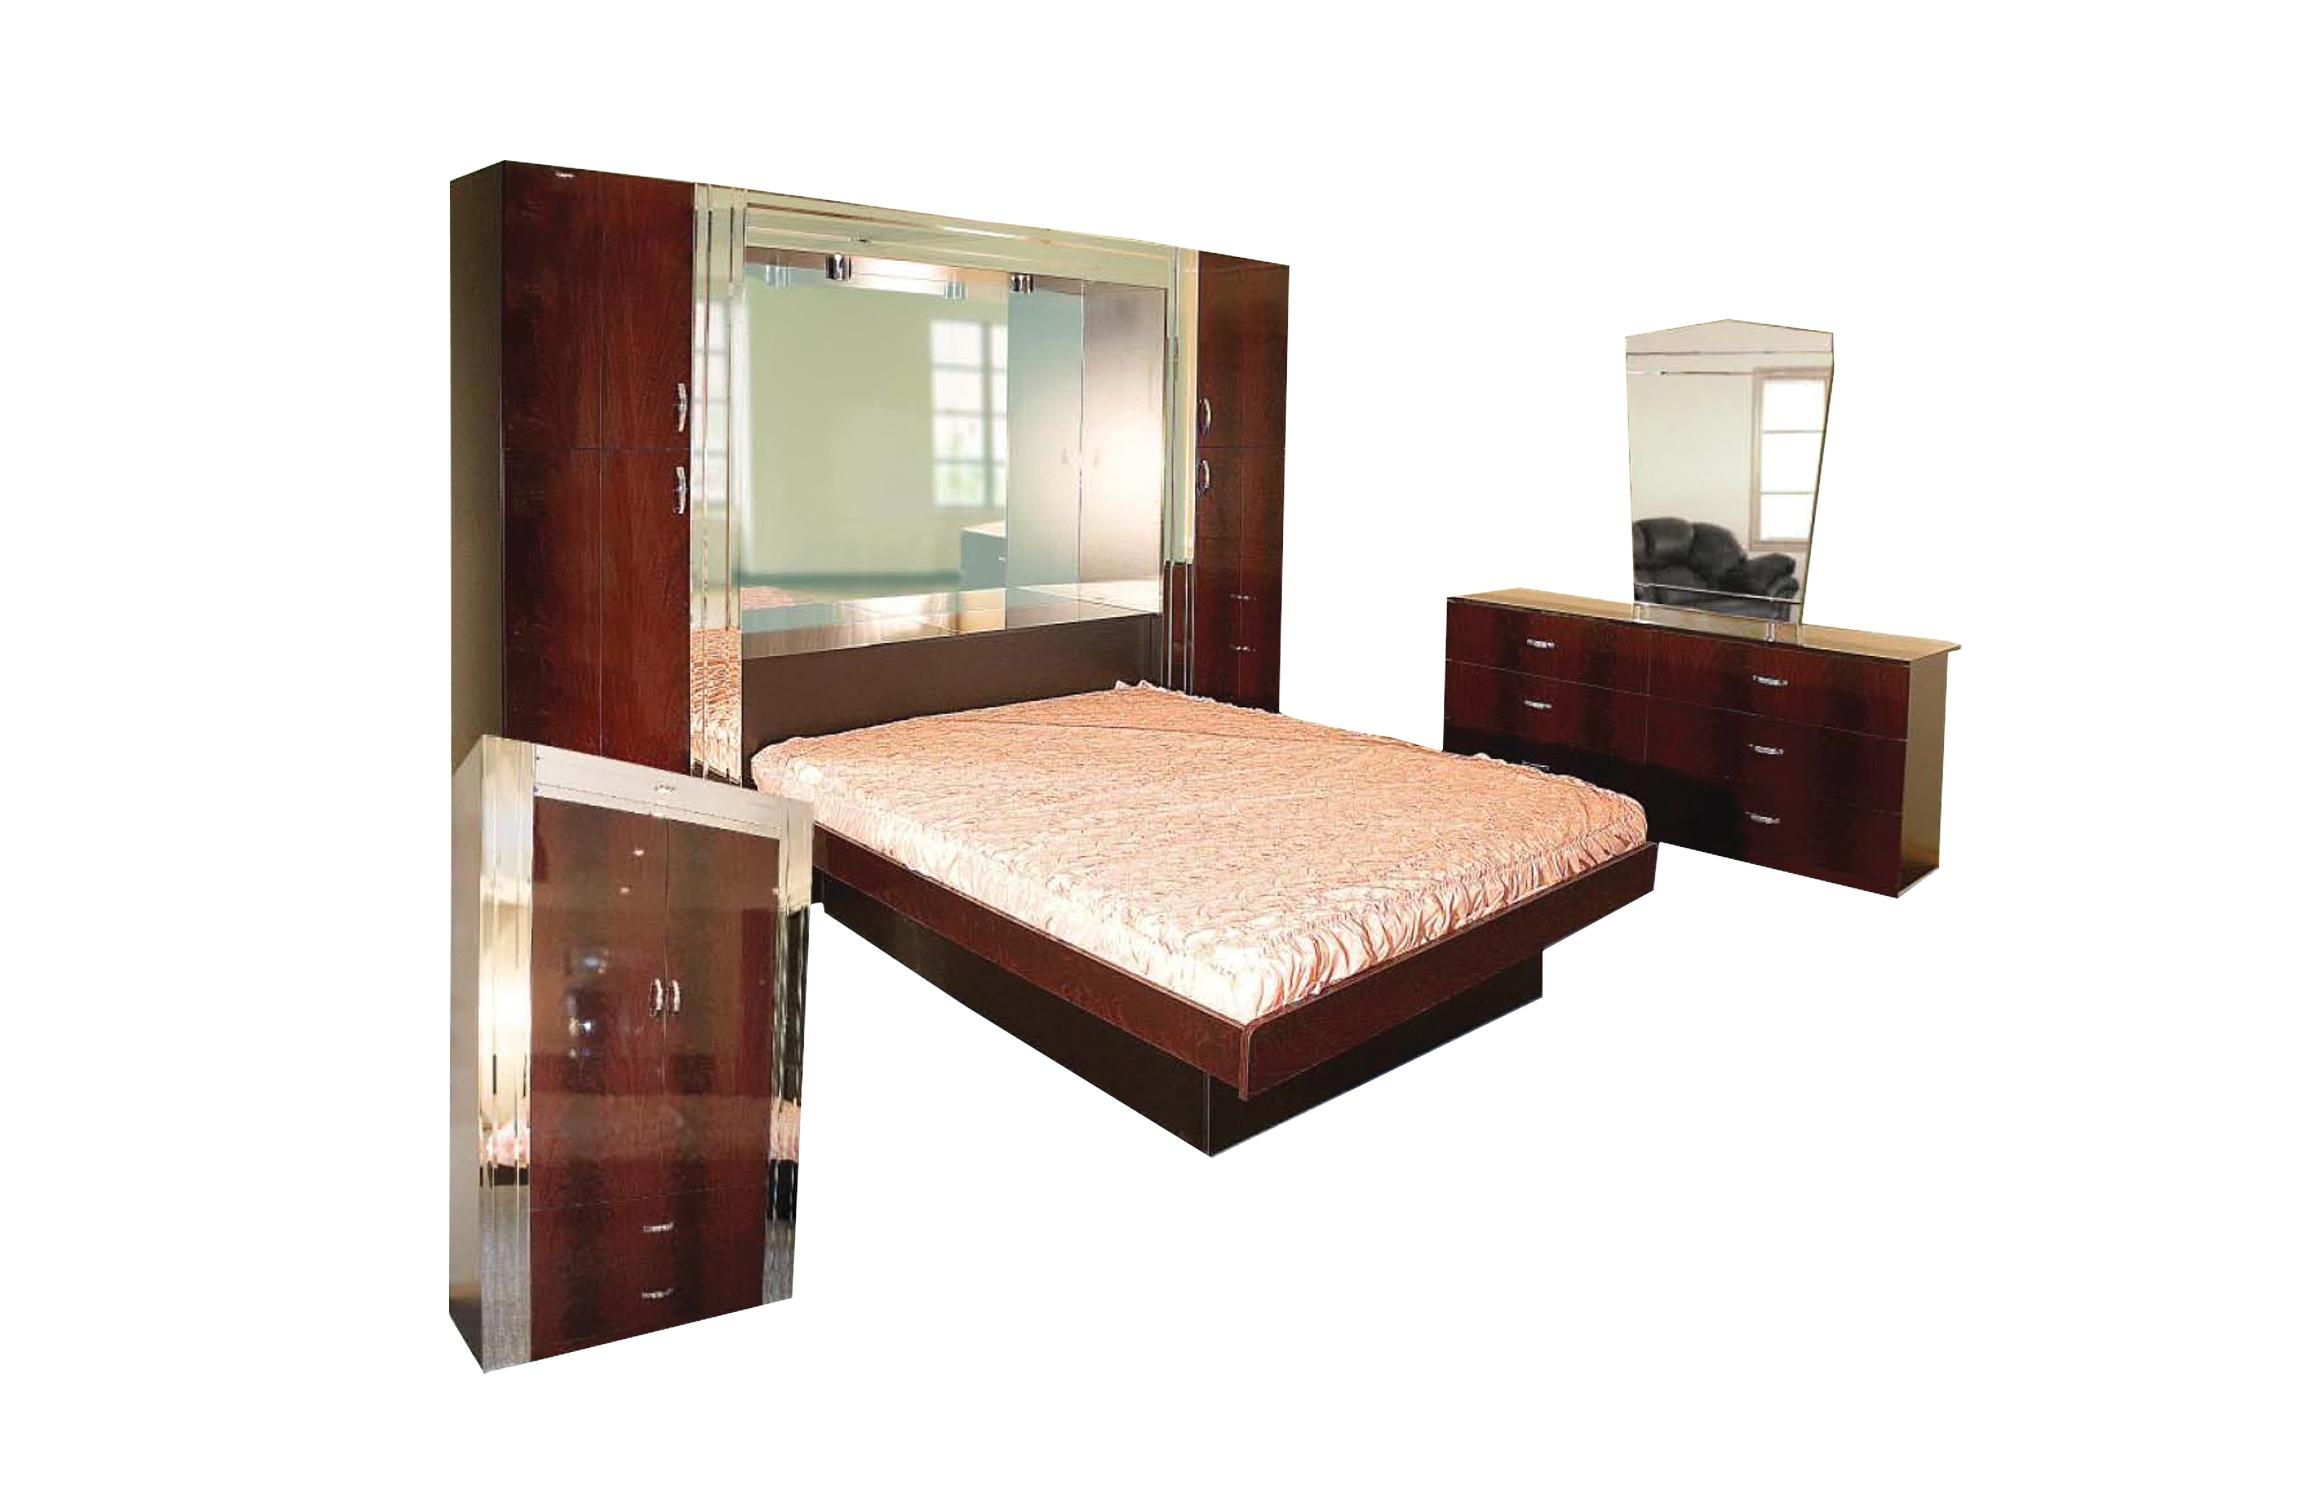 Sara Dark Brown Wooden Bedroom Set by Central Furniture Factory